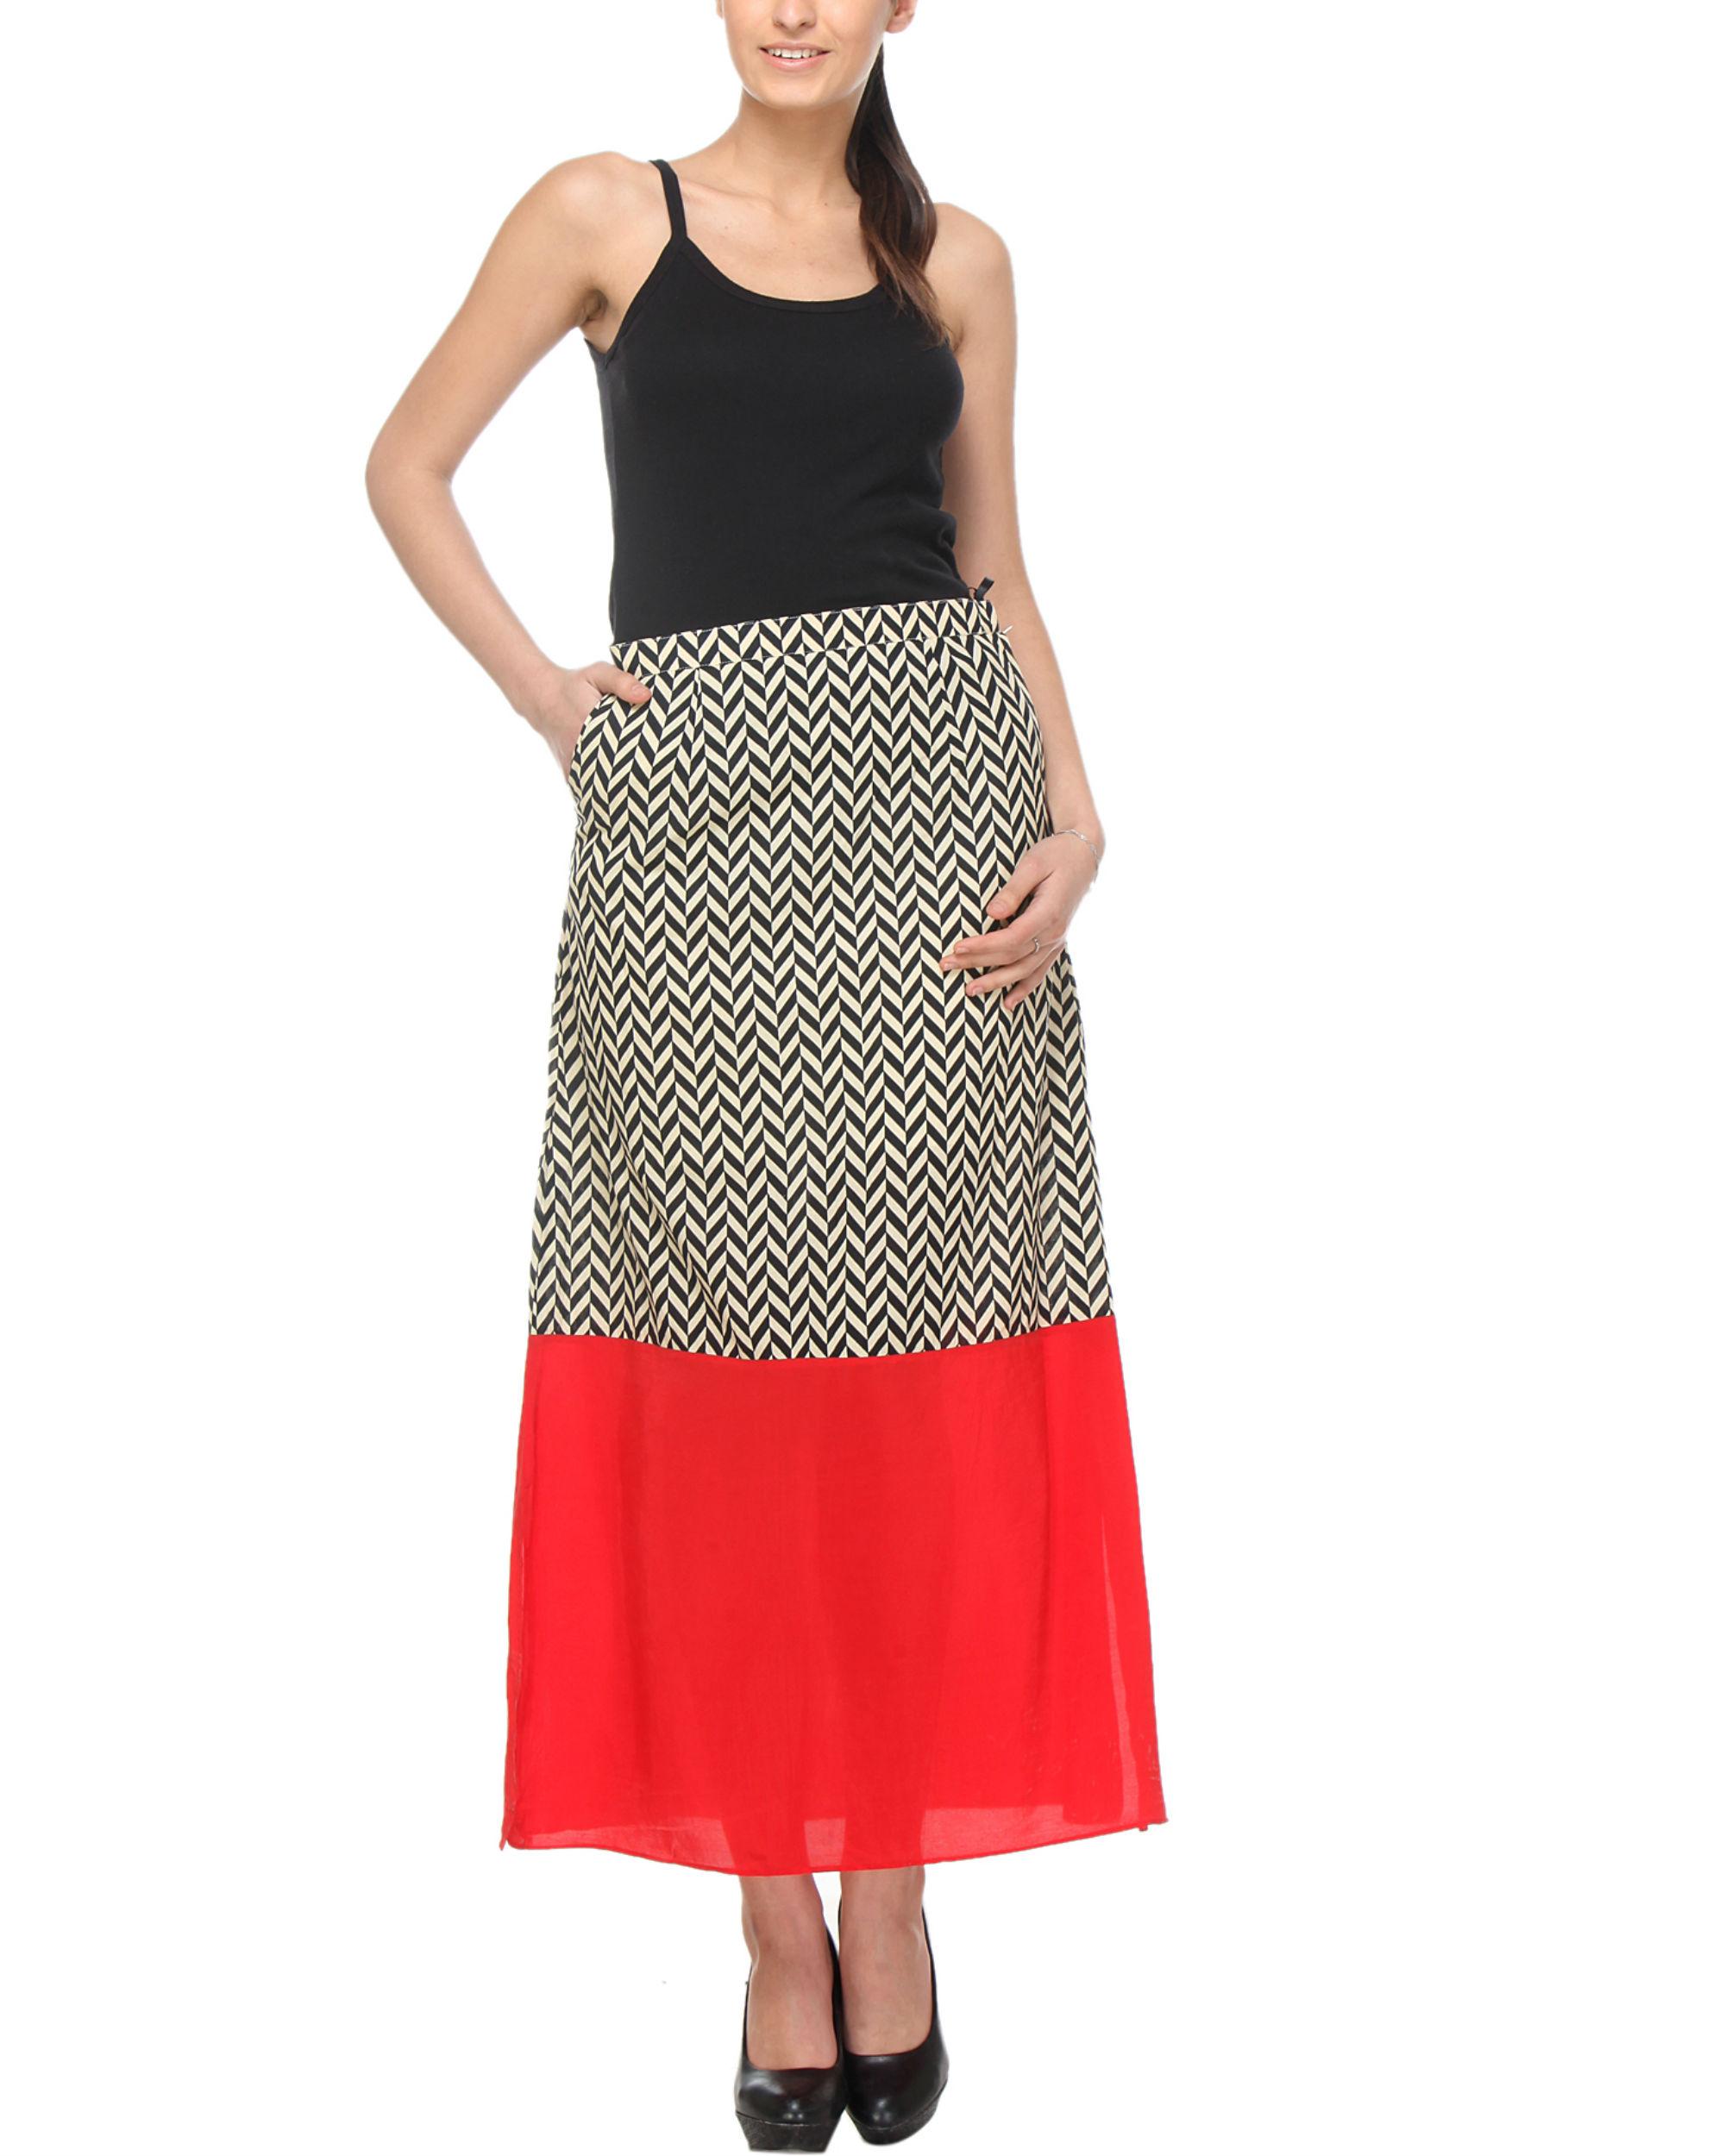 Chevron red skirt